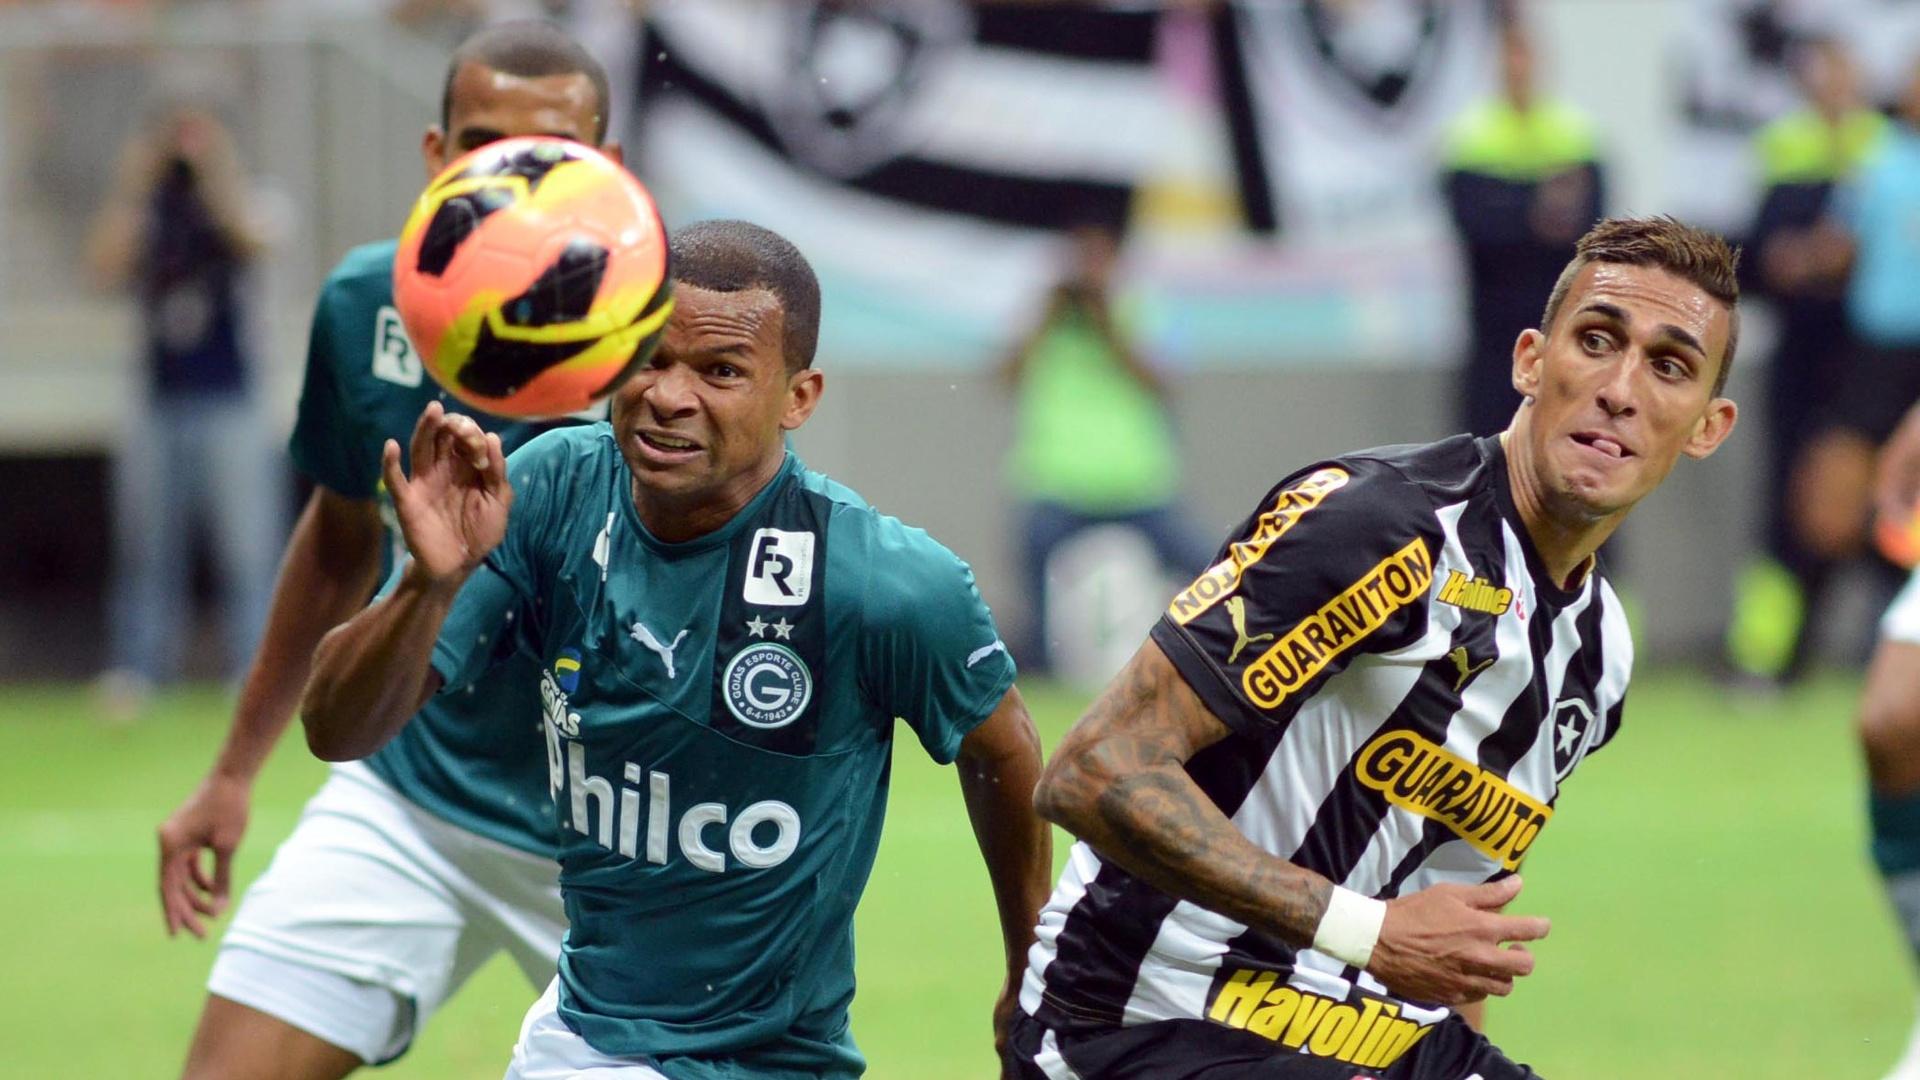 10.08.2013 - Rafael Marques e Vitor disputam a bola durante Botafogo x Goiás